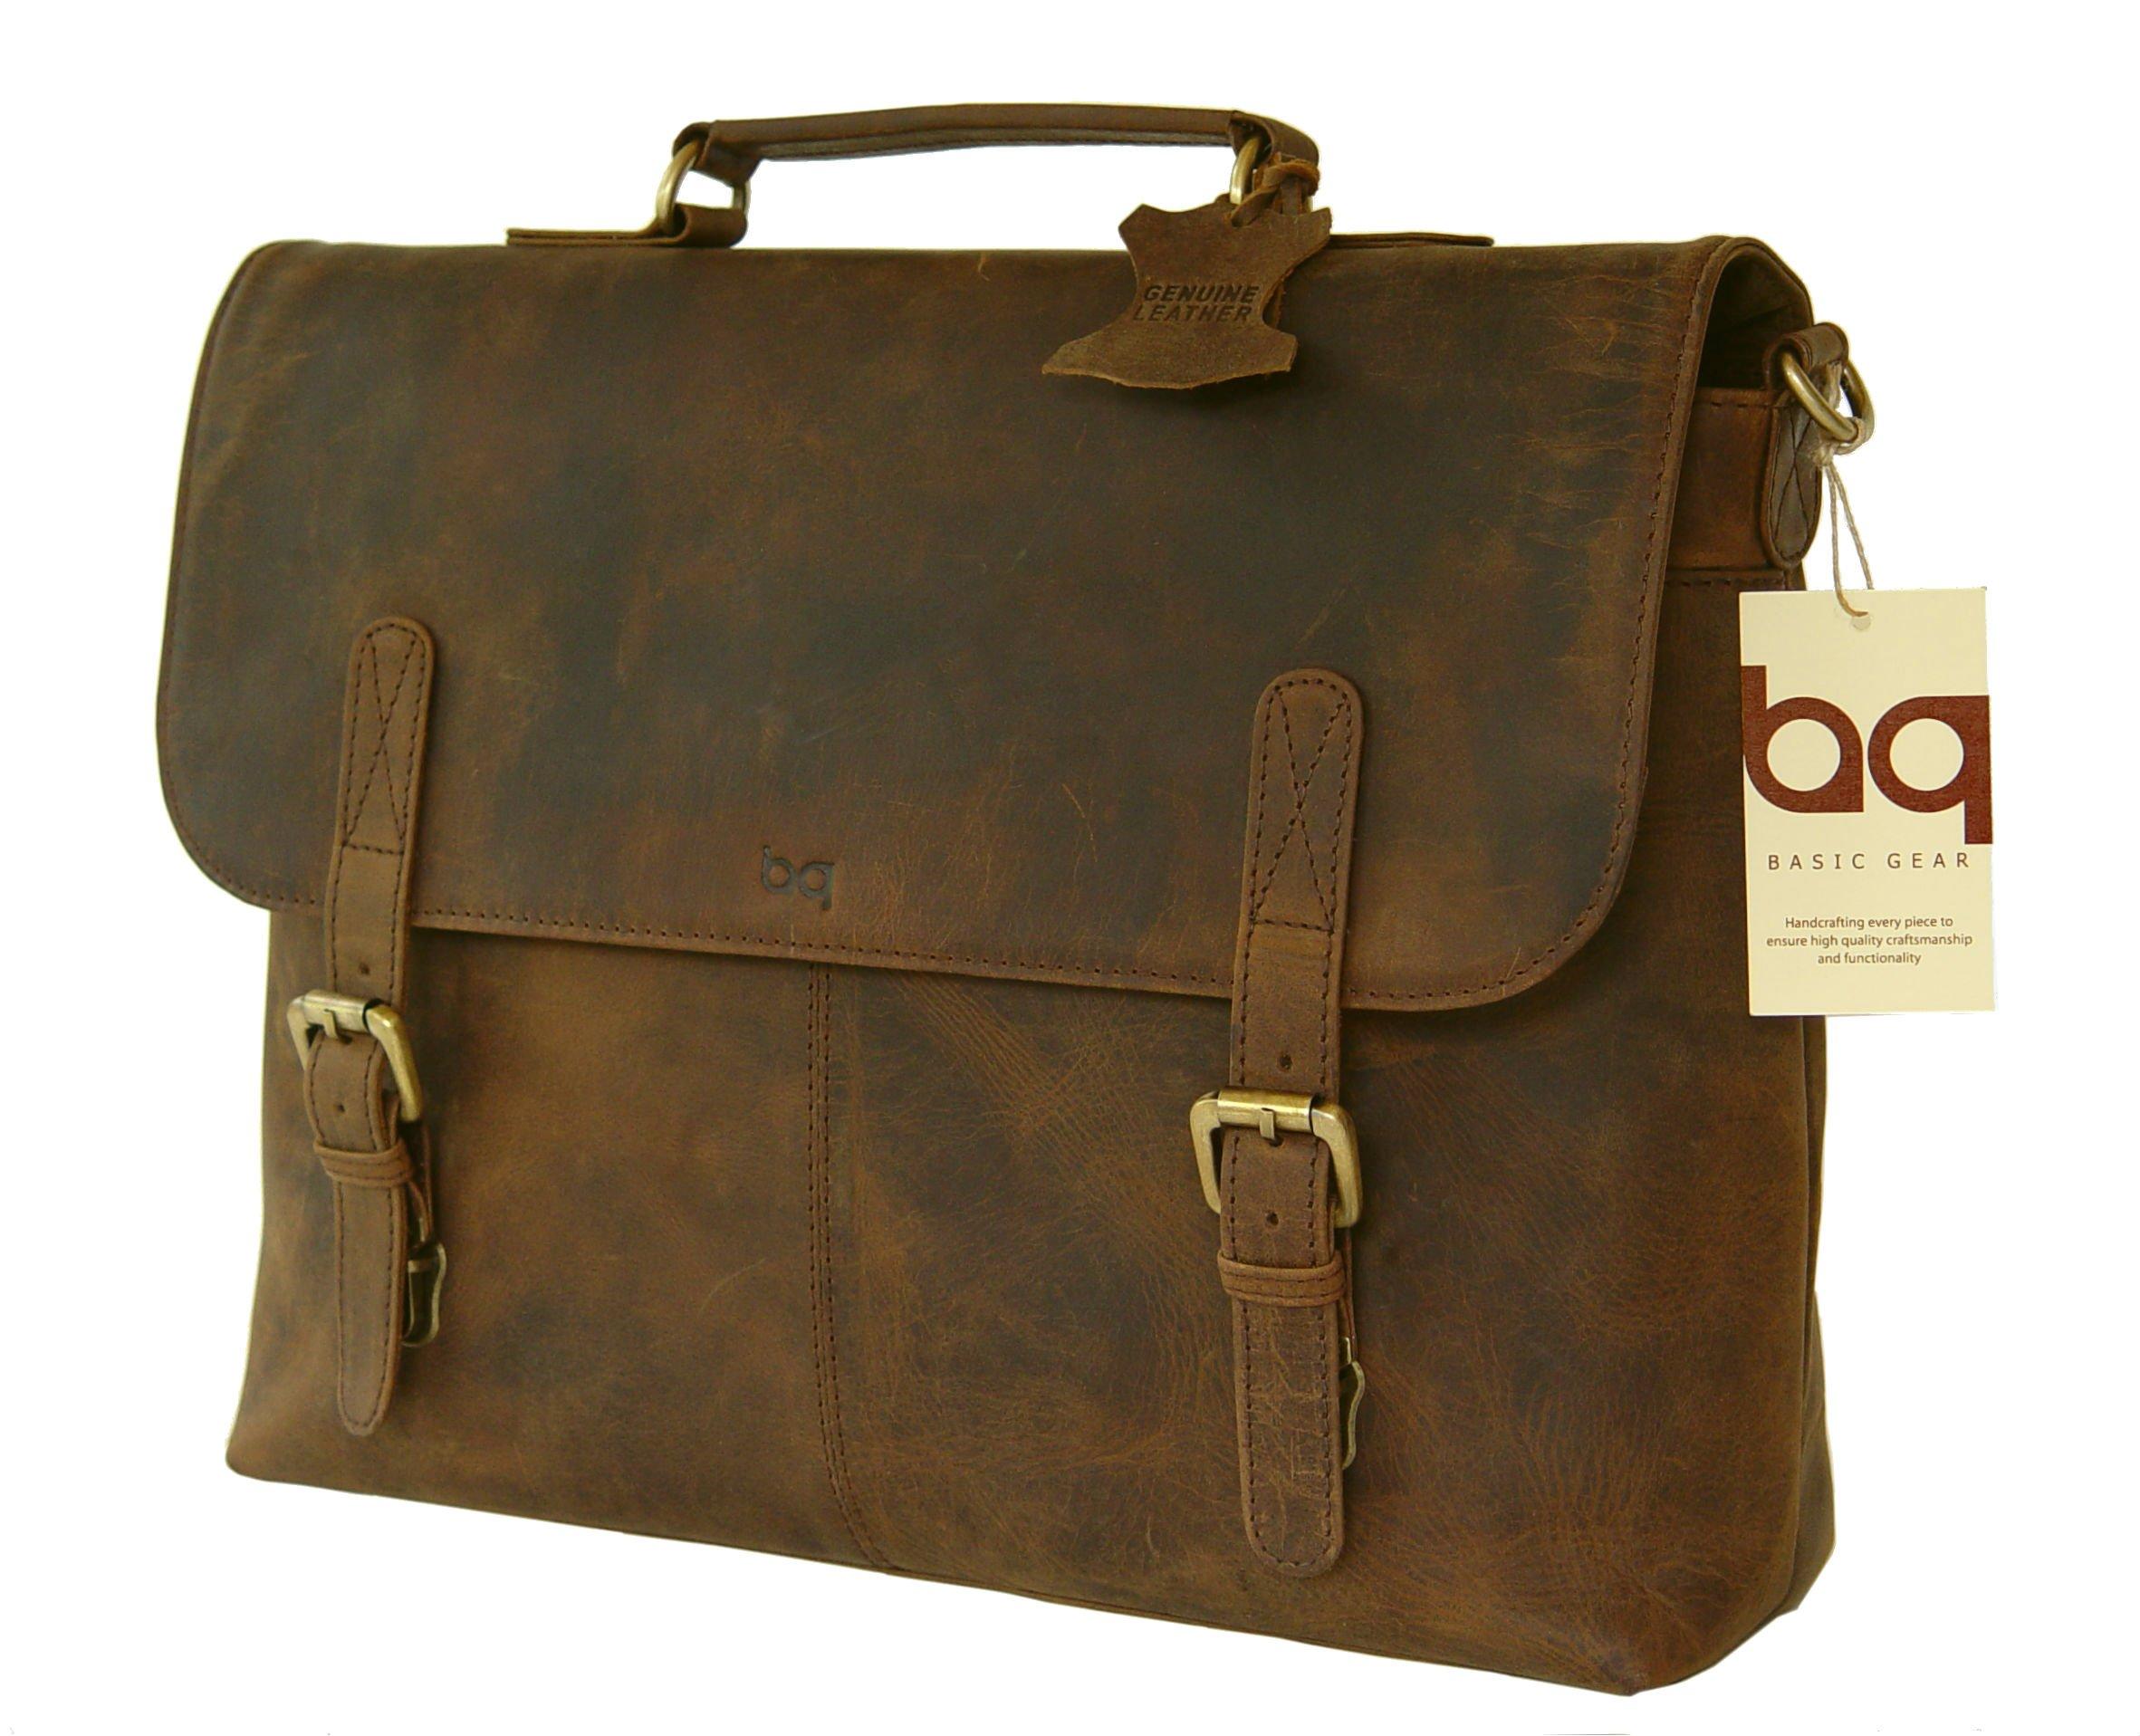 BASIC GEAR Crazy Horse Leather Flap-Over Laptop Messenger Bag in Vintage Rustic look